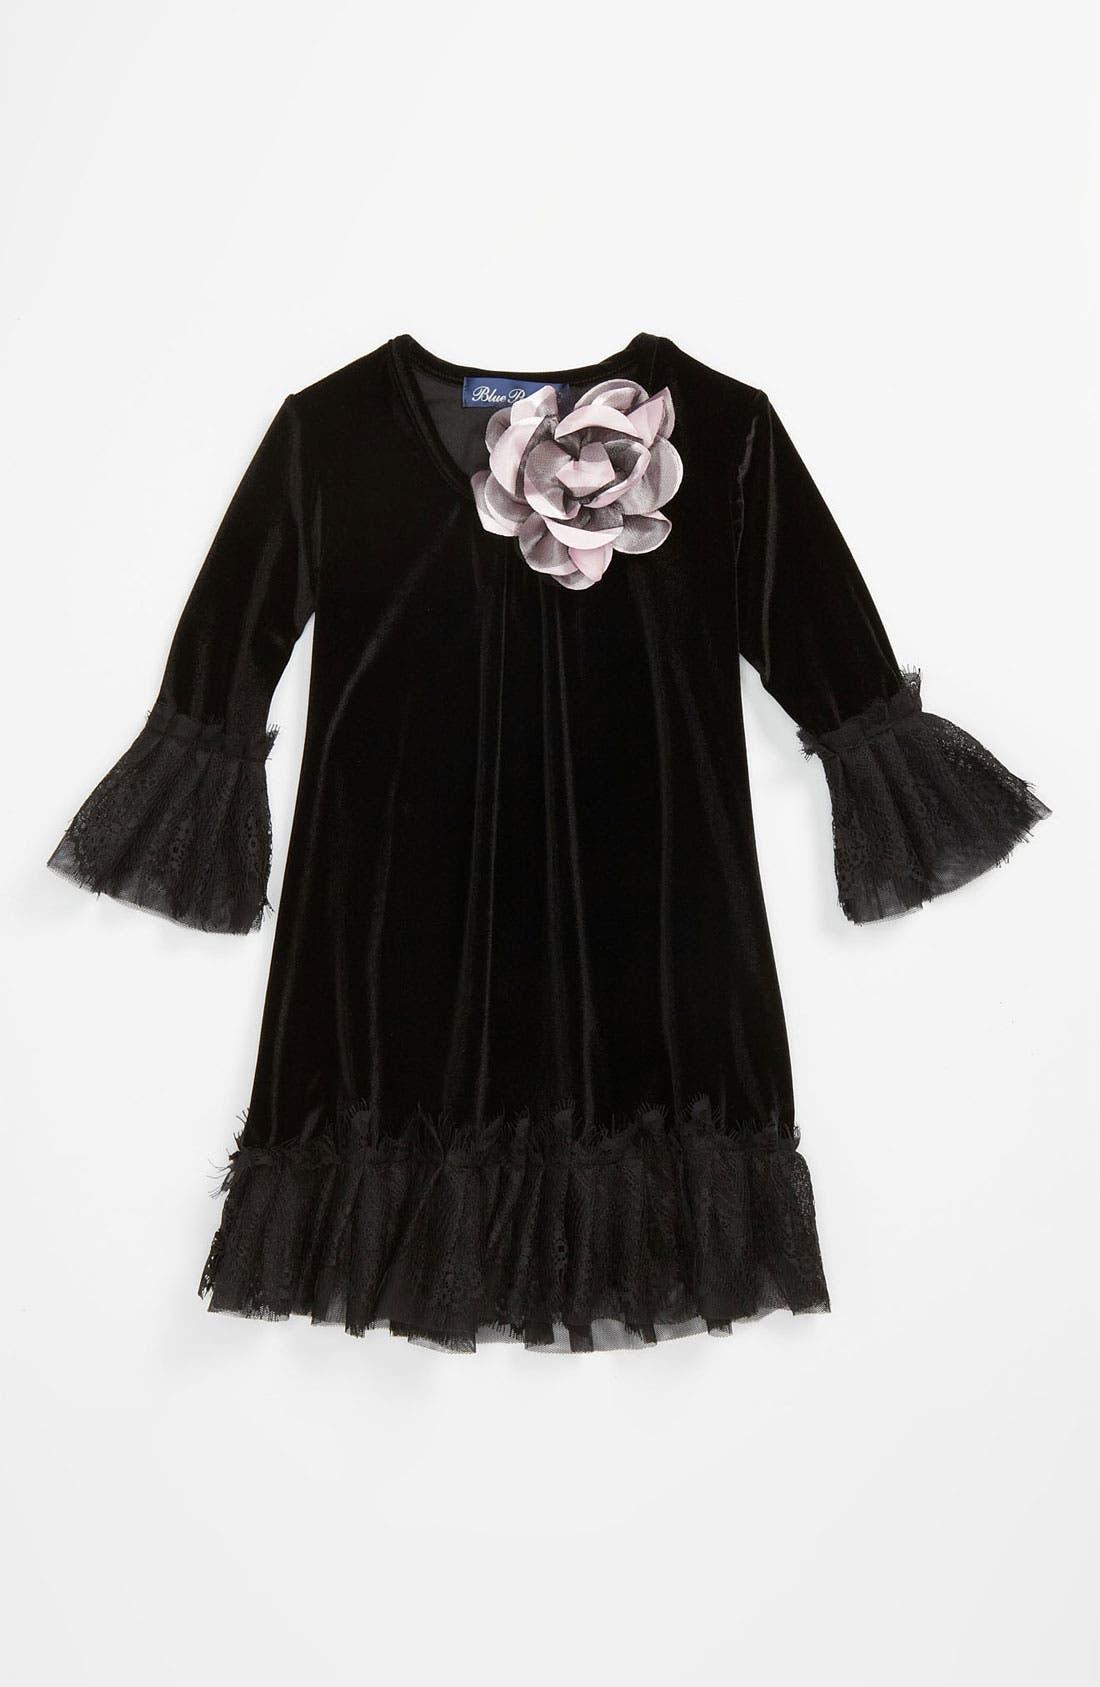 Alternate Image 1 Selected - Love U Lots Velour Dress (Little Girls)